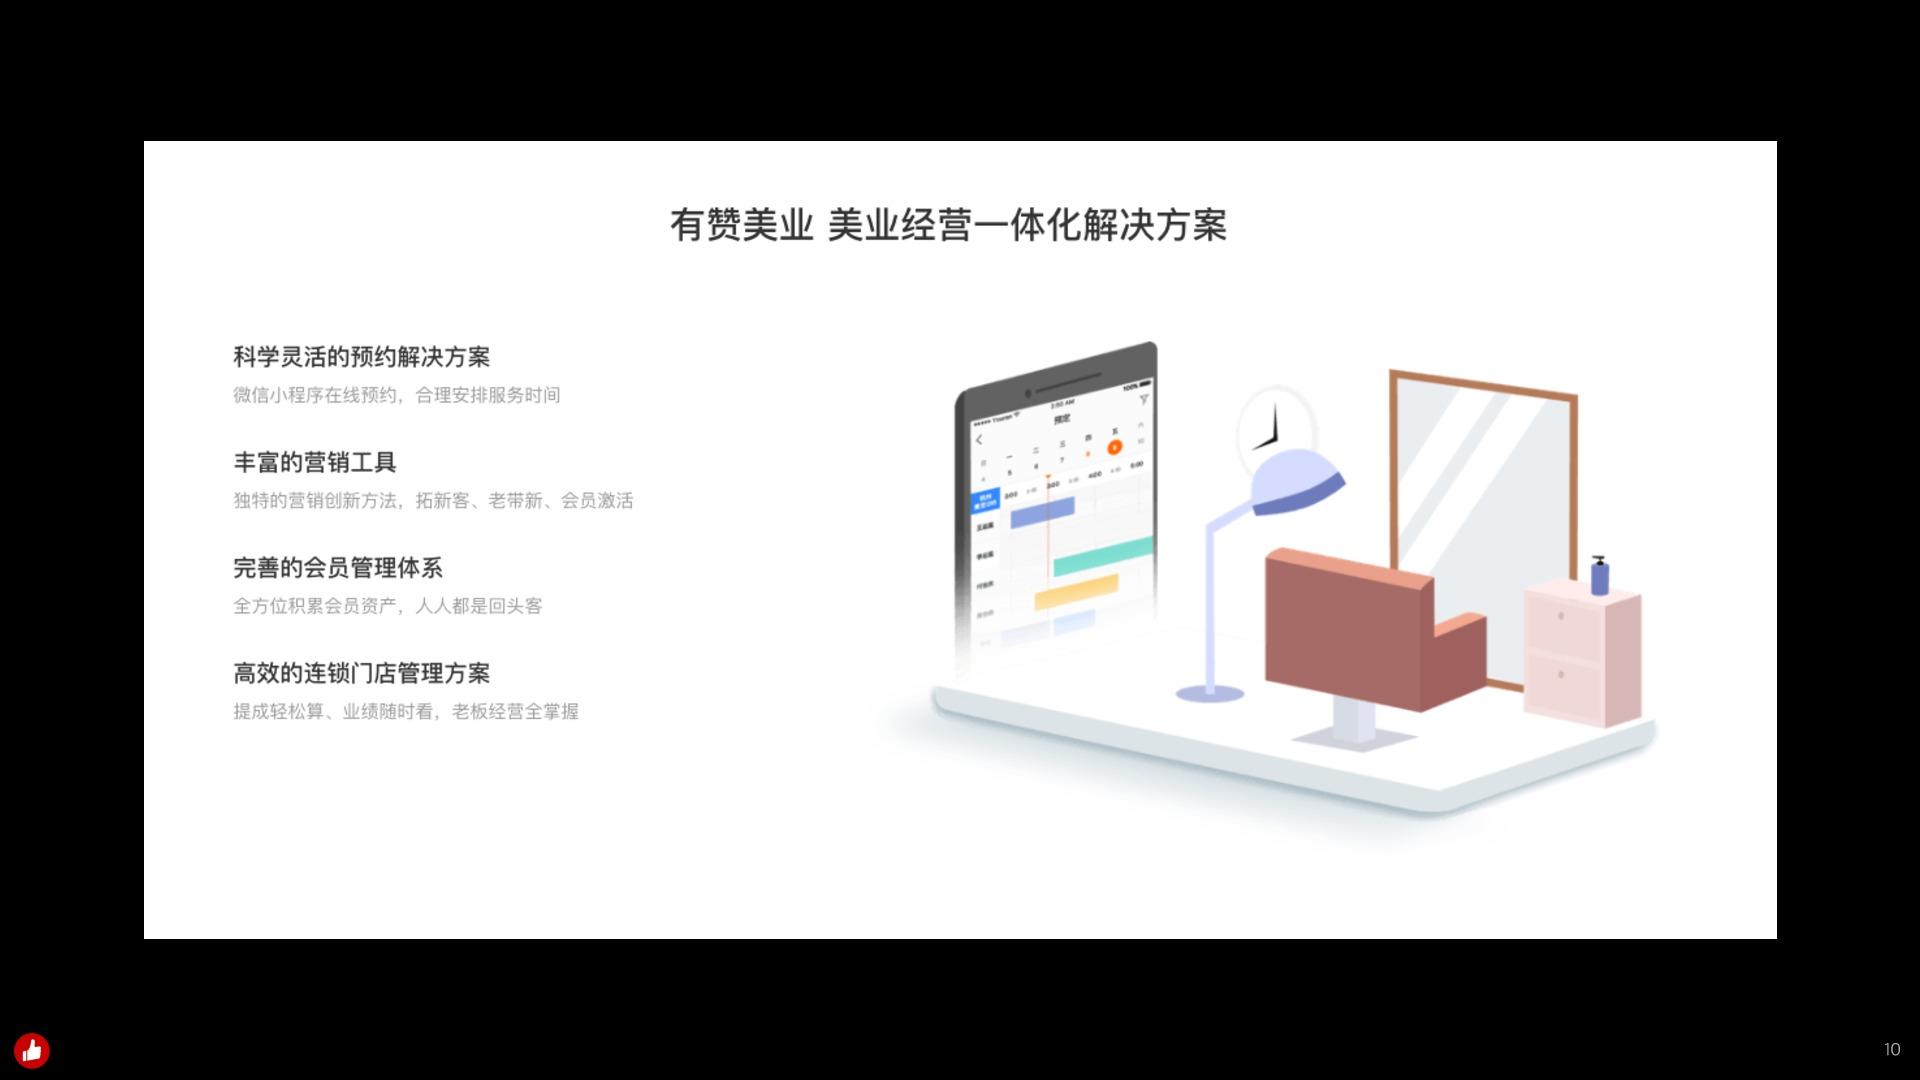 https://opentalk-blog.b0.upaiyun.com/prod/2018-11-26/cd5c34177cb1d3a18b2fd01f0af91f90